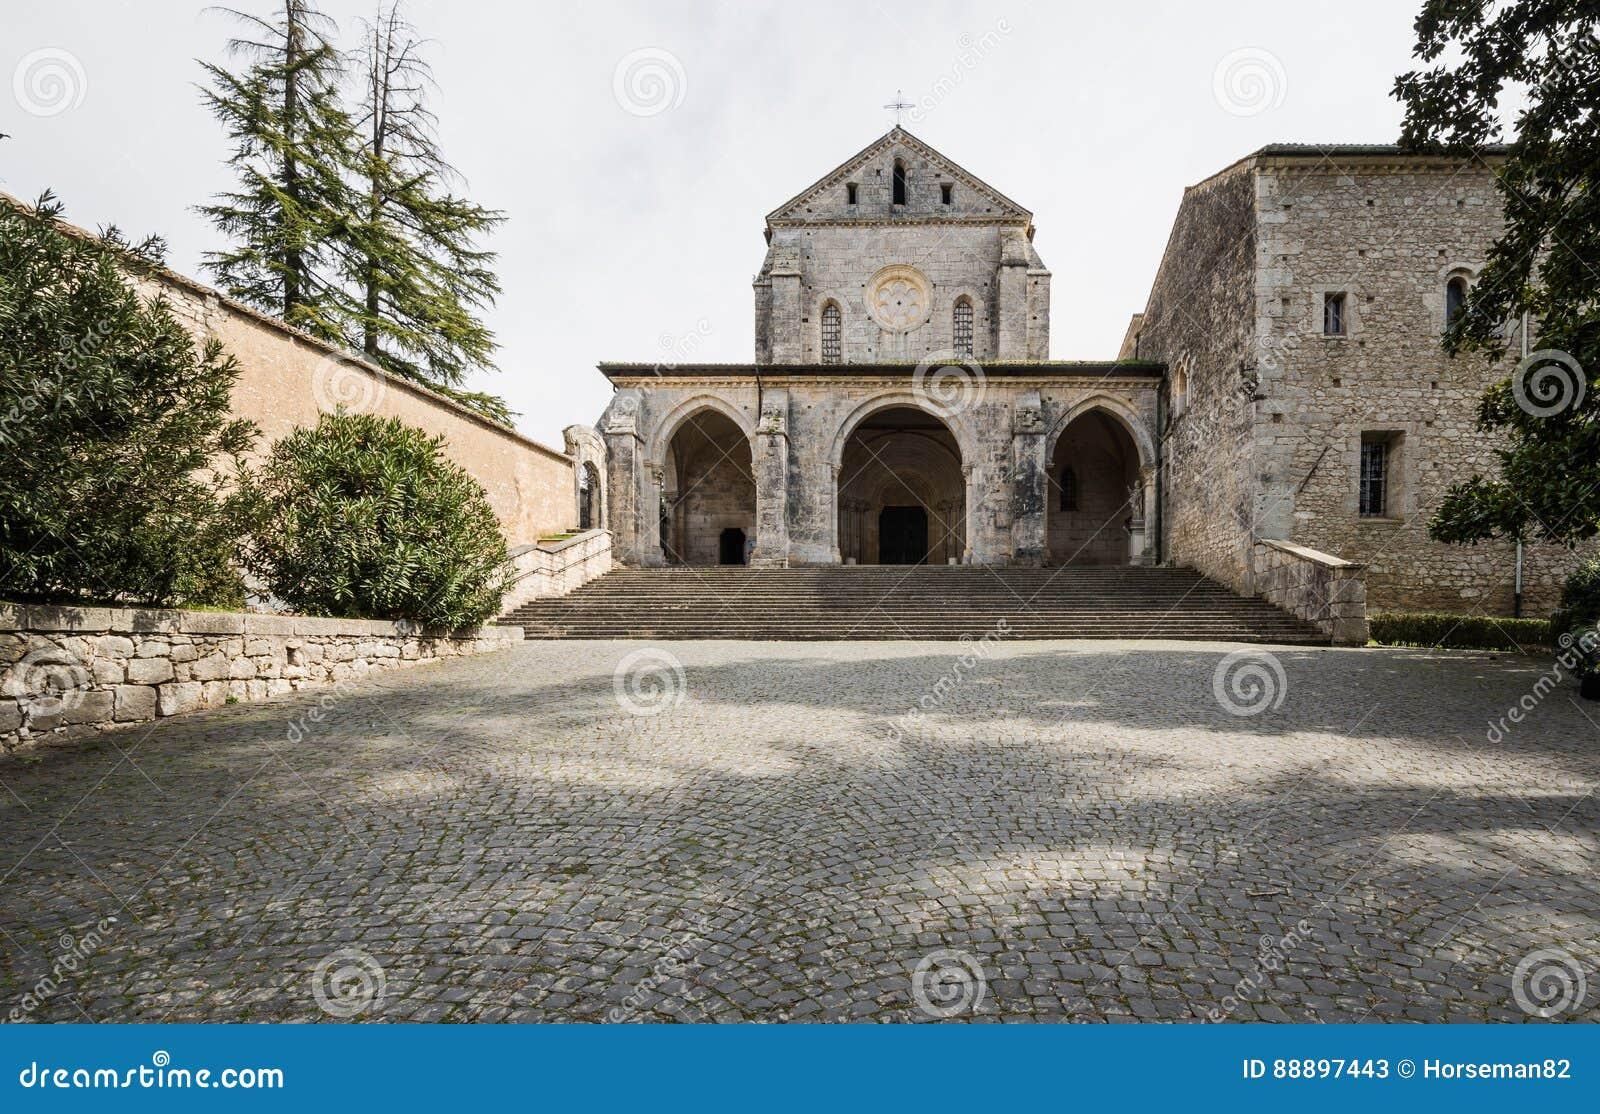 Casamari-Abtei in Ciociaria, Frosinone, Italien